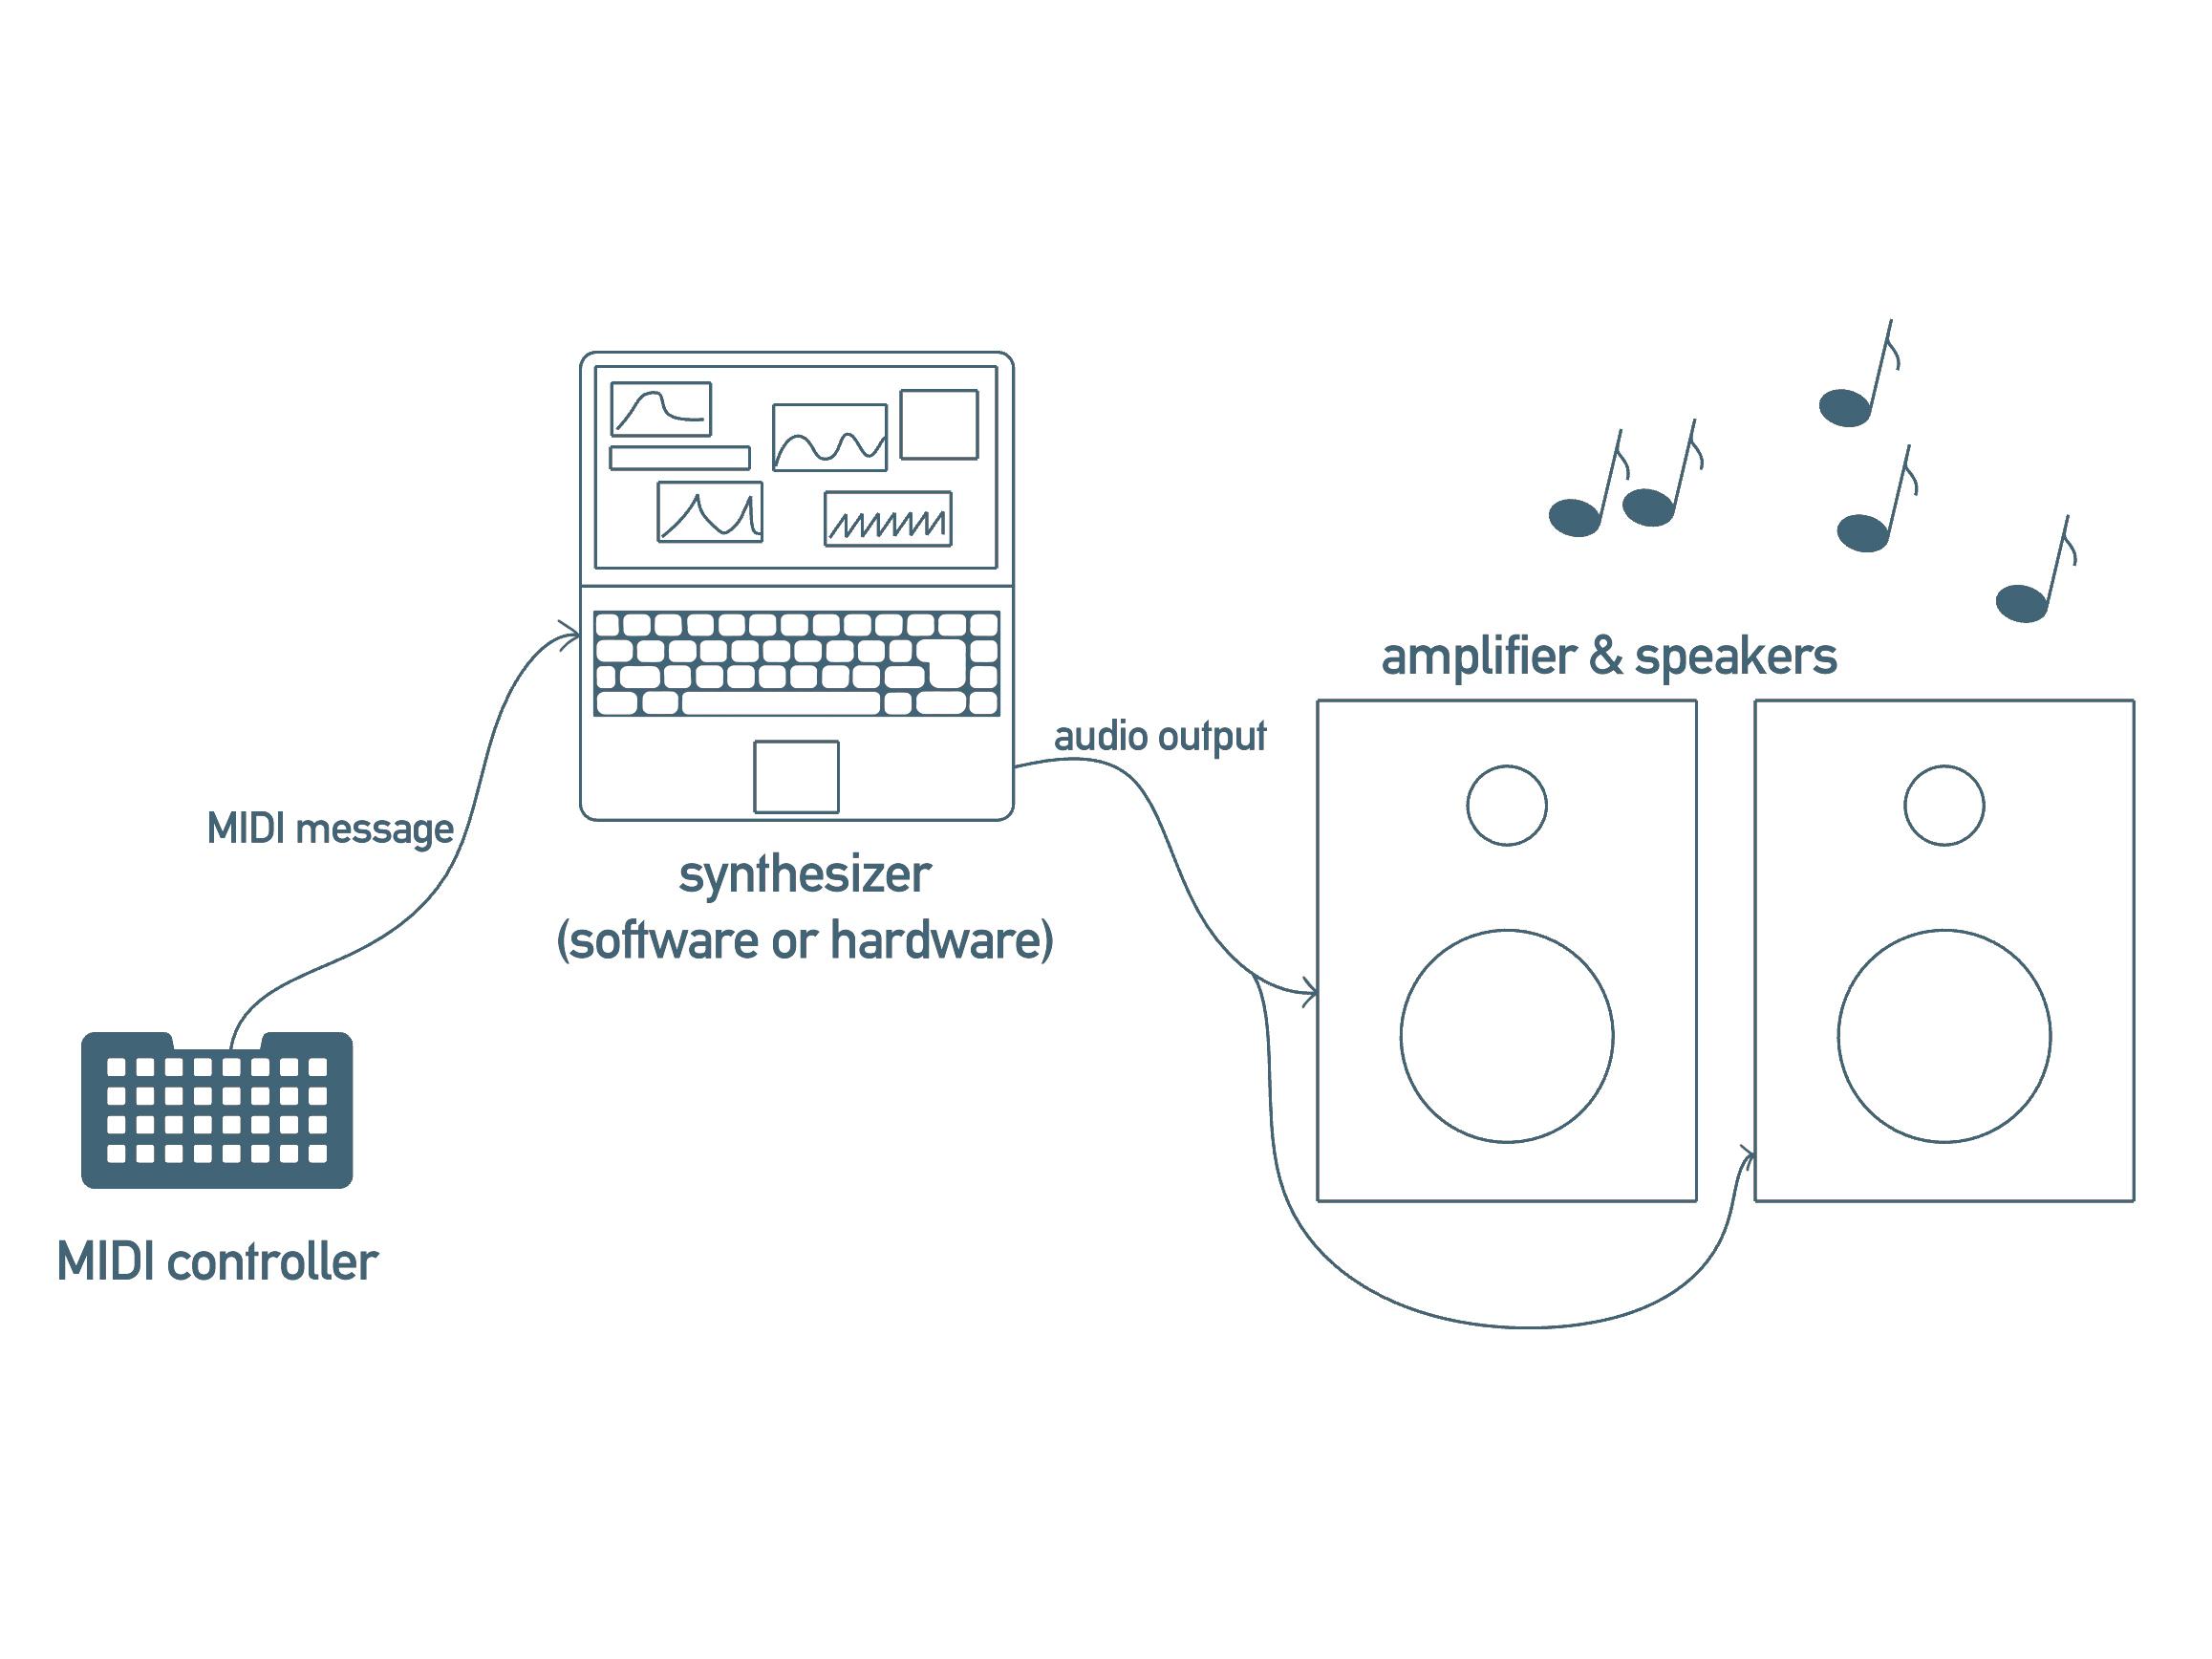 hacks_projects_midi_block_diagram.jpg